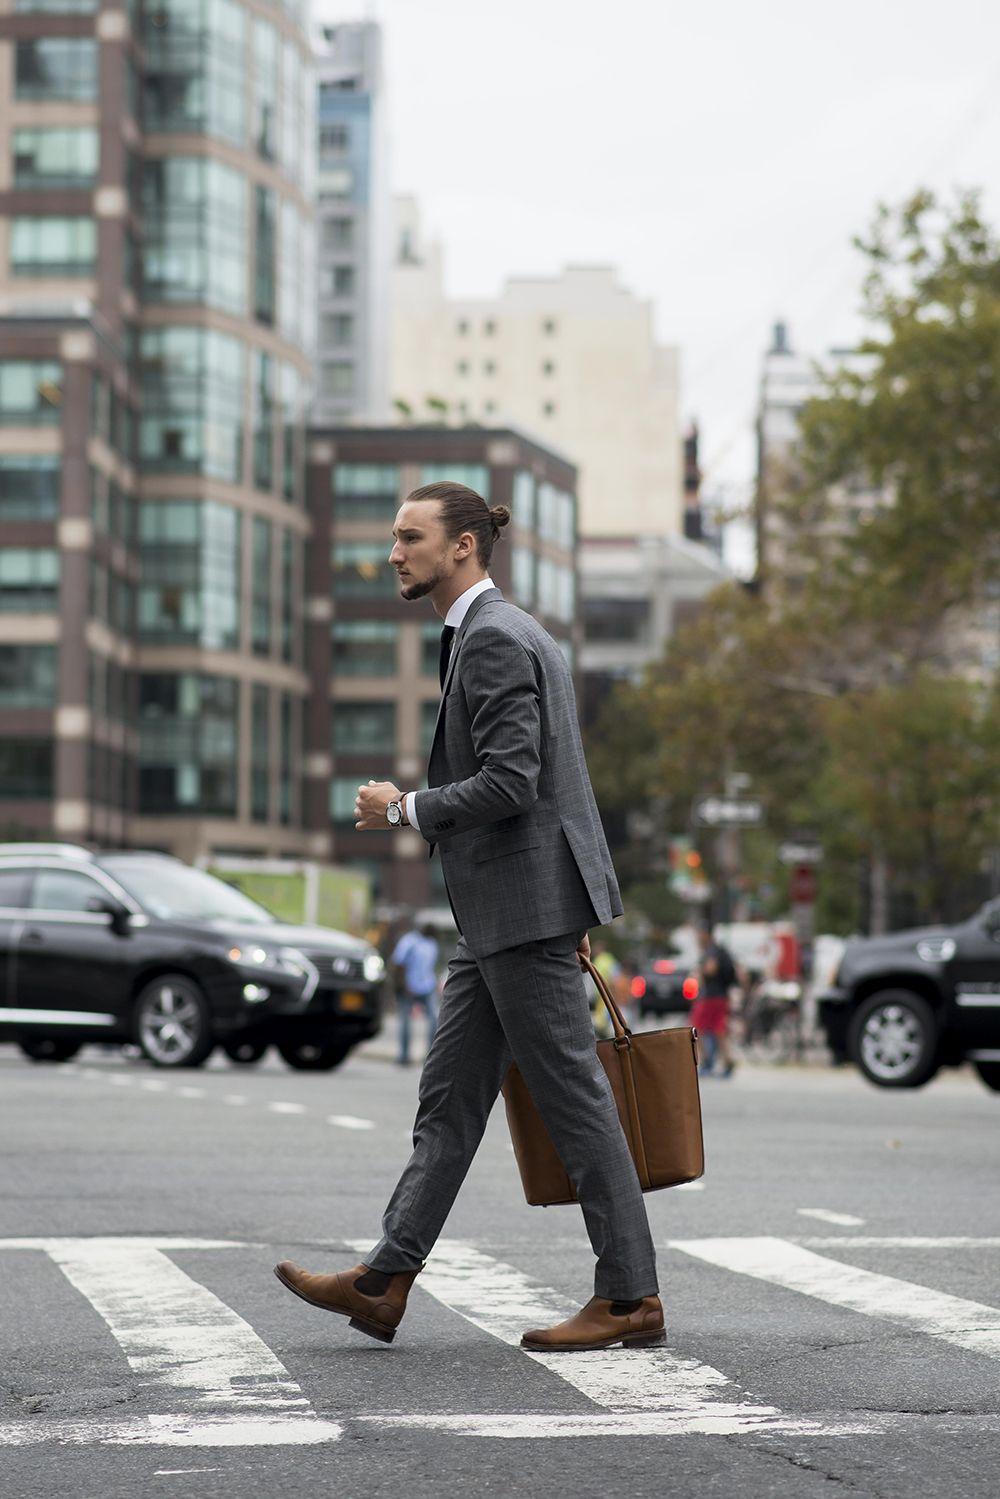 Men's Grey Suit, White Dress Shirt, Brown Leather Chelsea ...